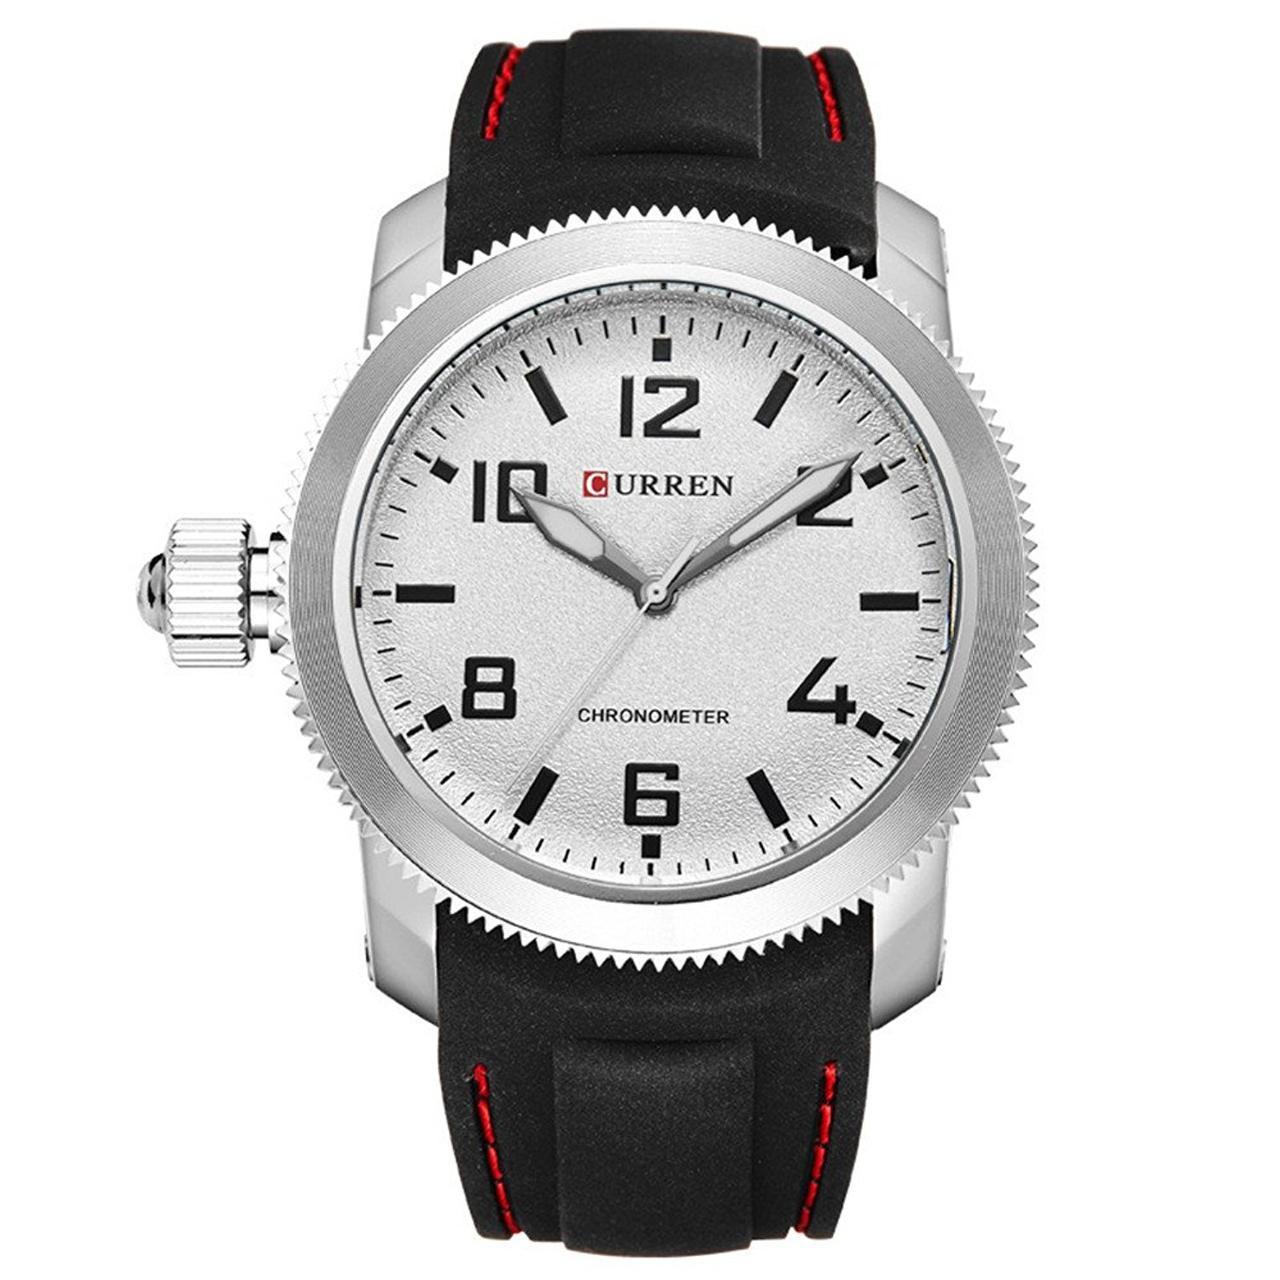 Мужские наручные часы Curren 8173 (optb002530)